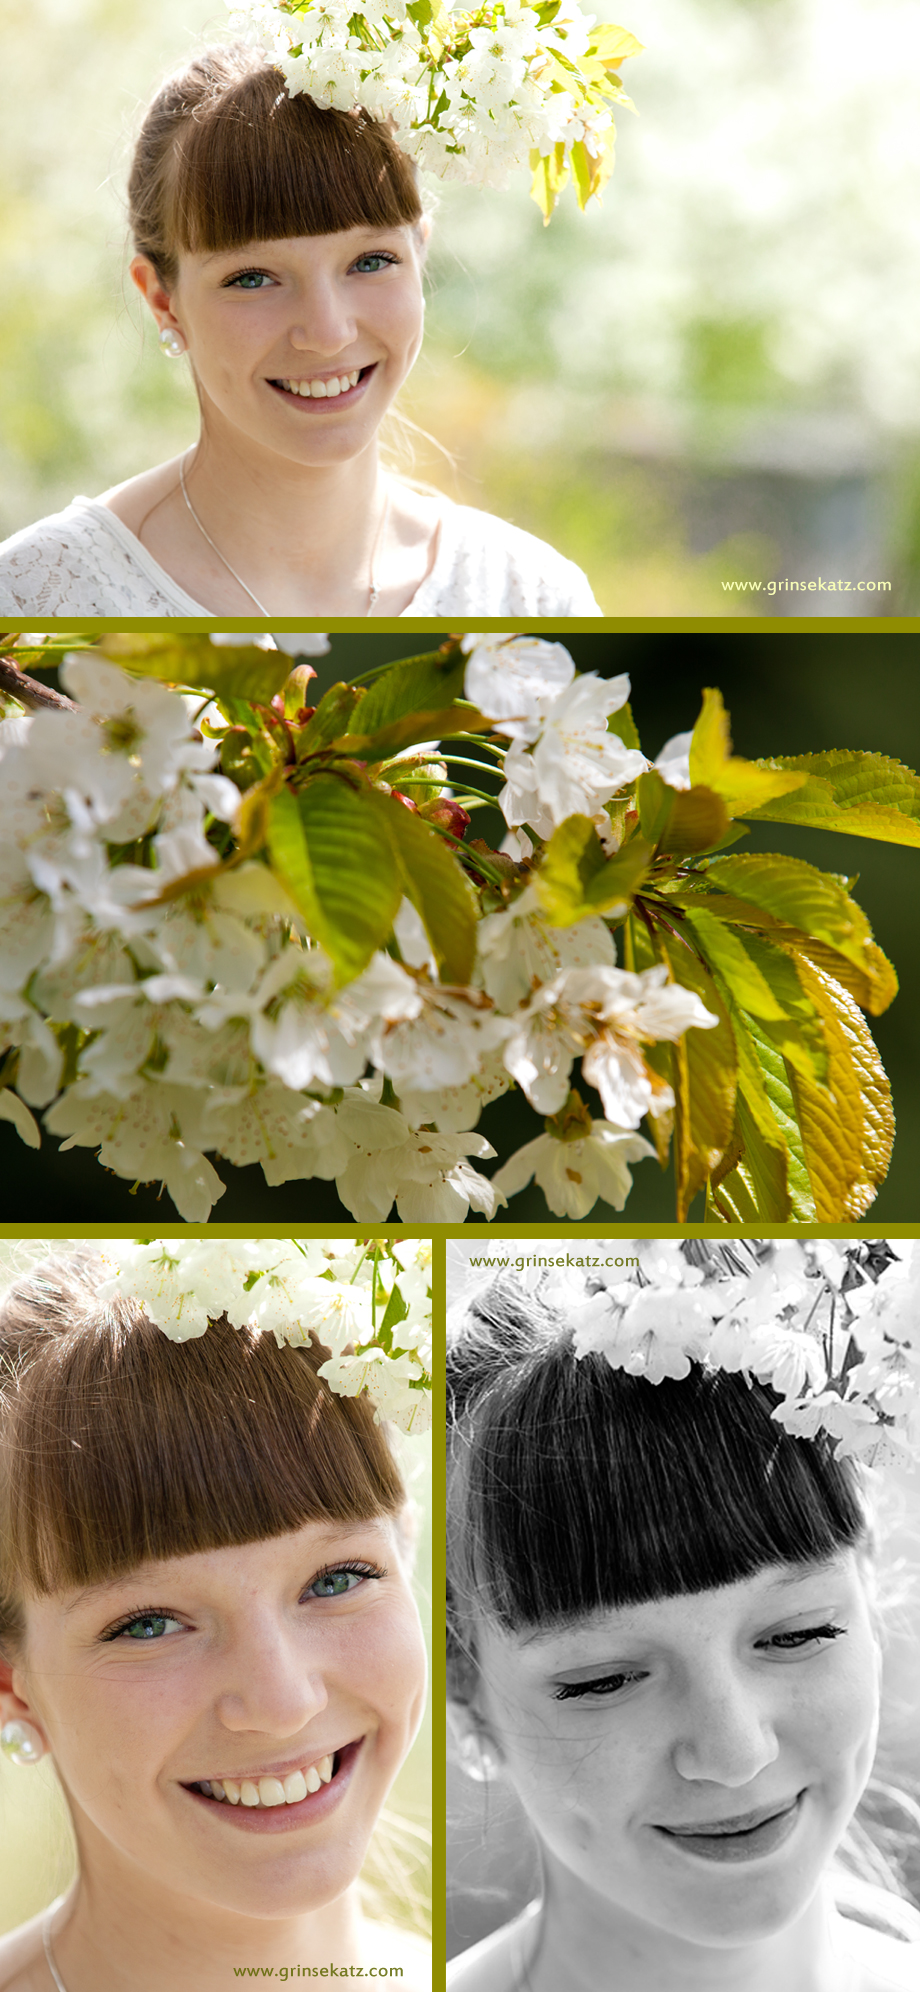 outdoor-photography-flower-berlin-grinsekatz